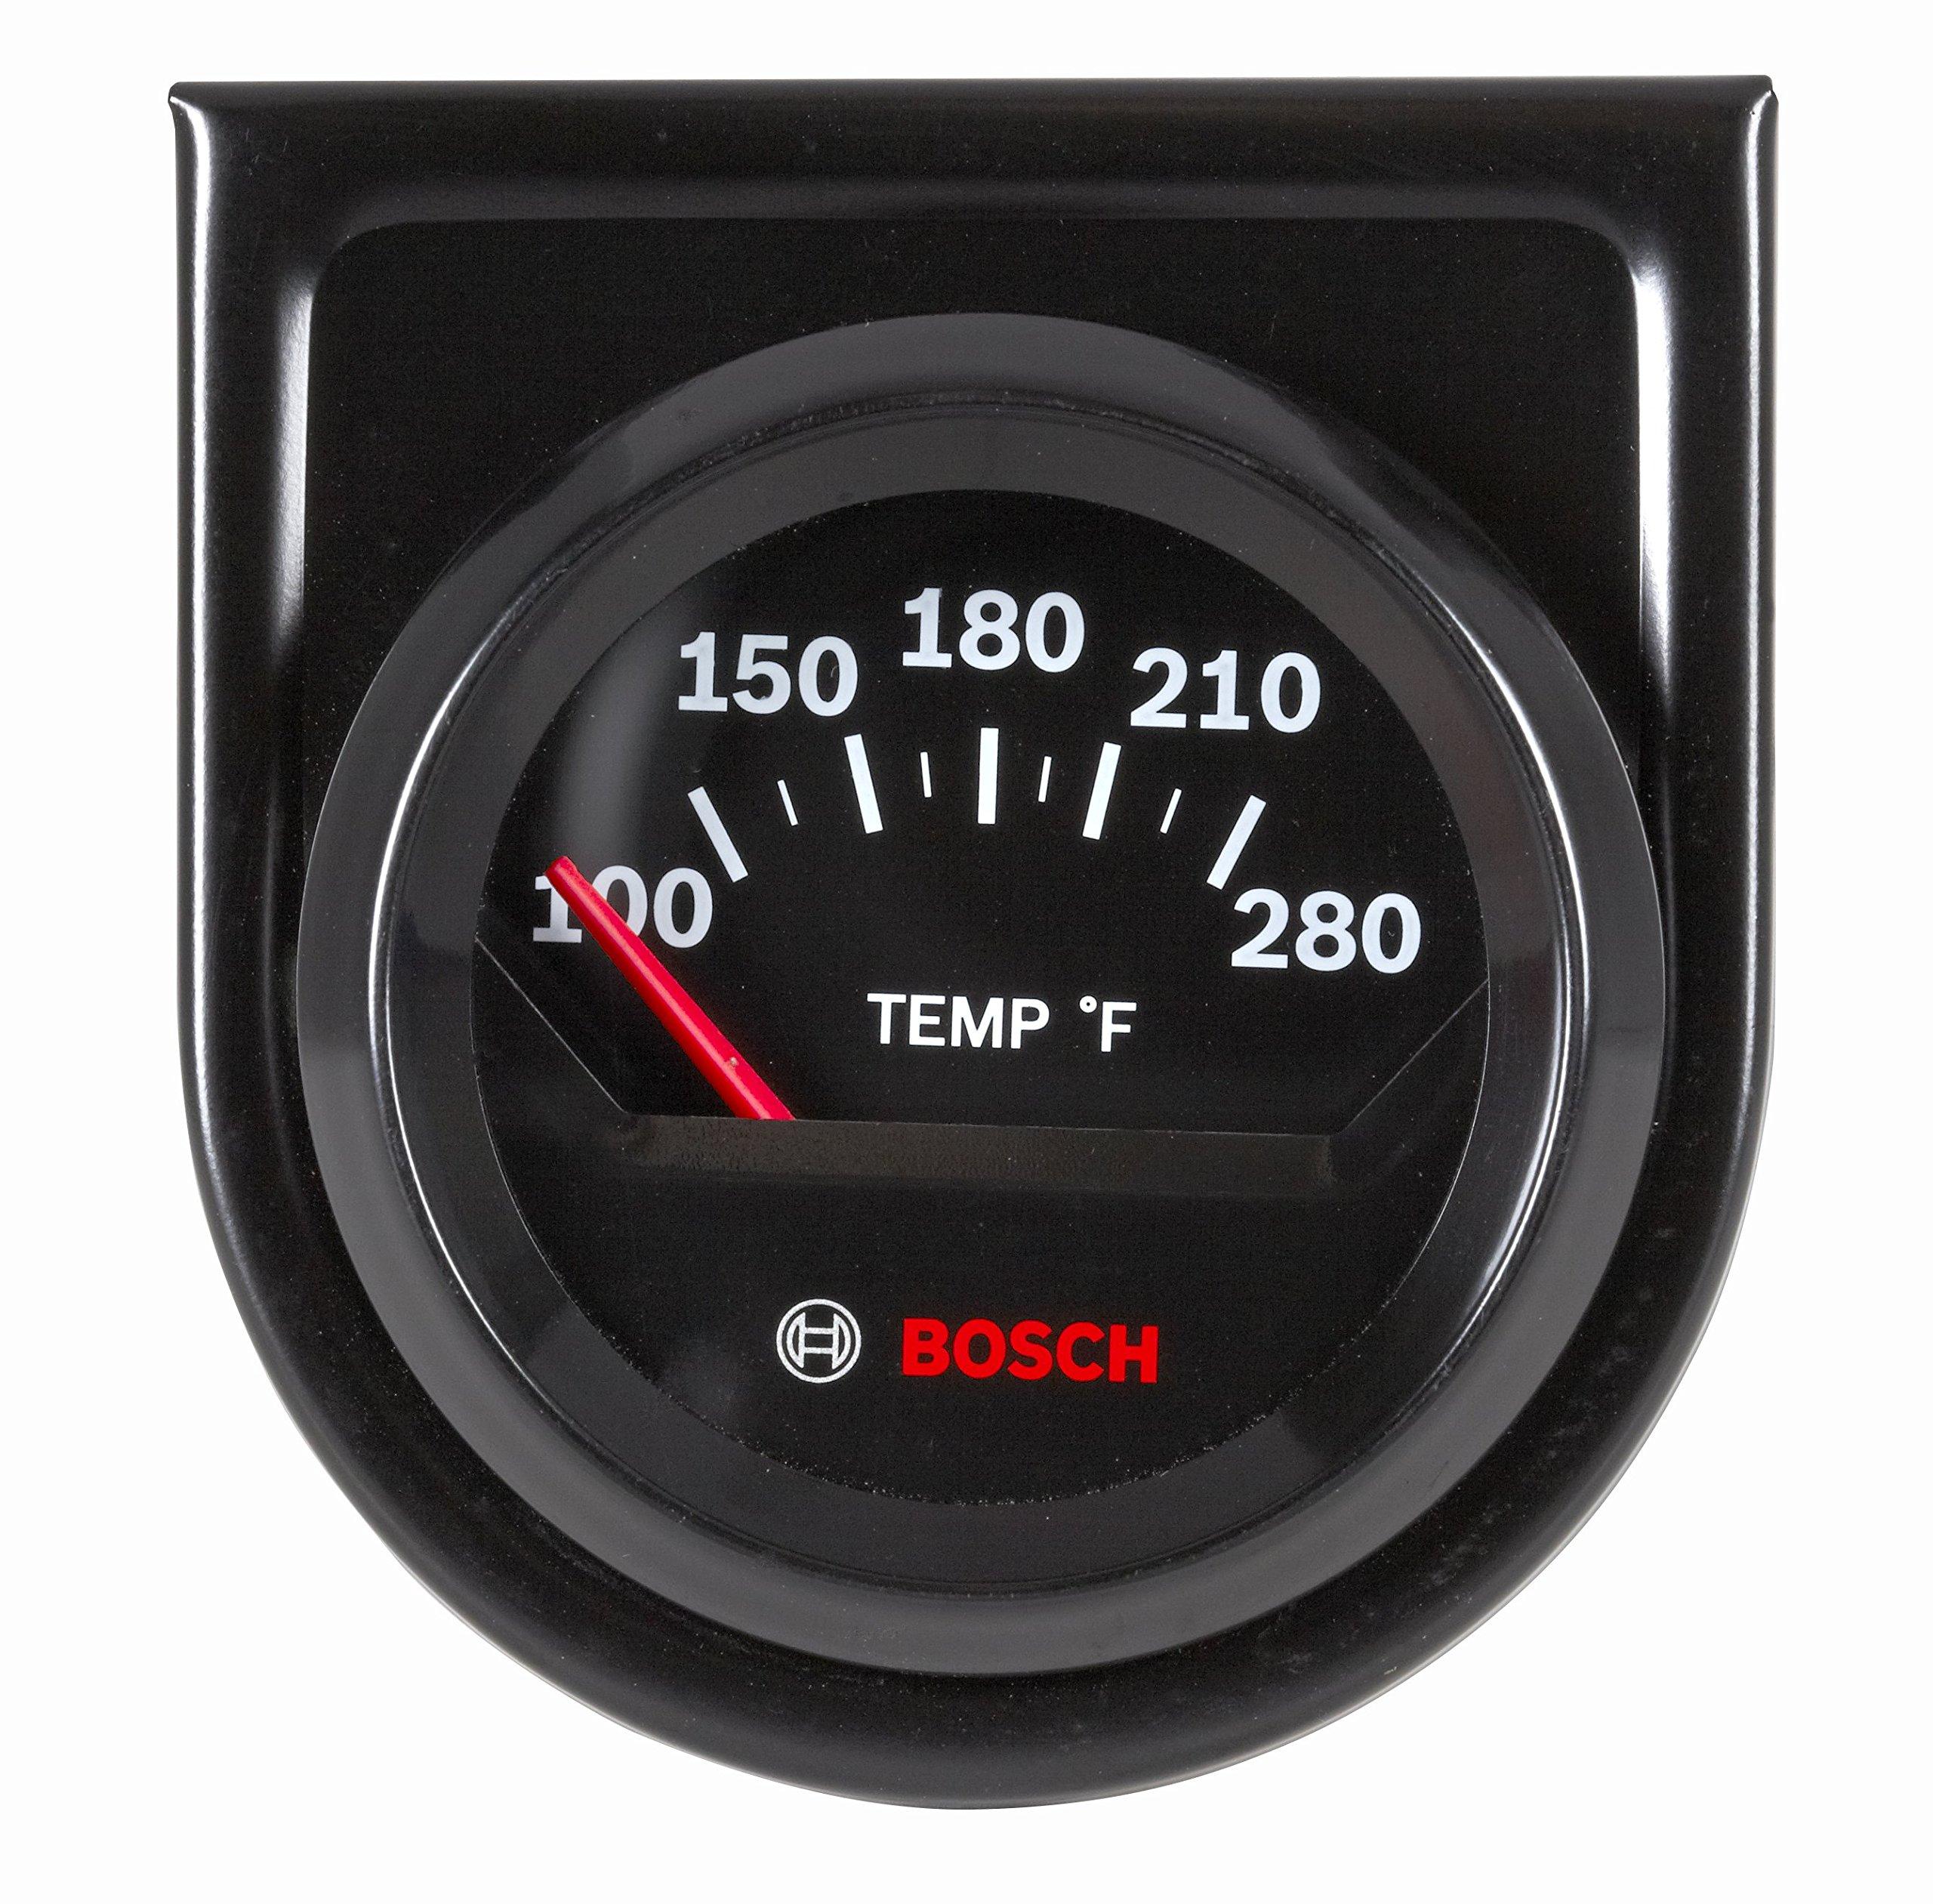 Bosch SP0F000049 Style Line 2'' Electrical Water/Oil Temperature Gauge (Black Dial Face, Black Bezel) by Bosch Automotive